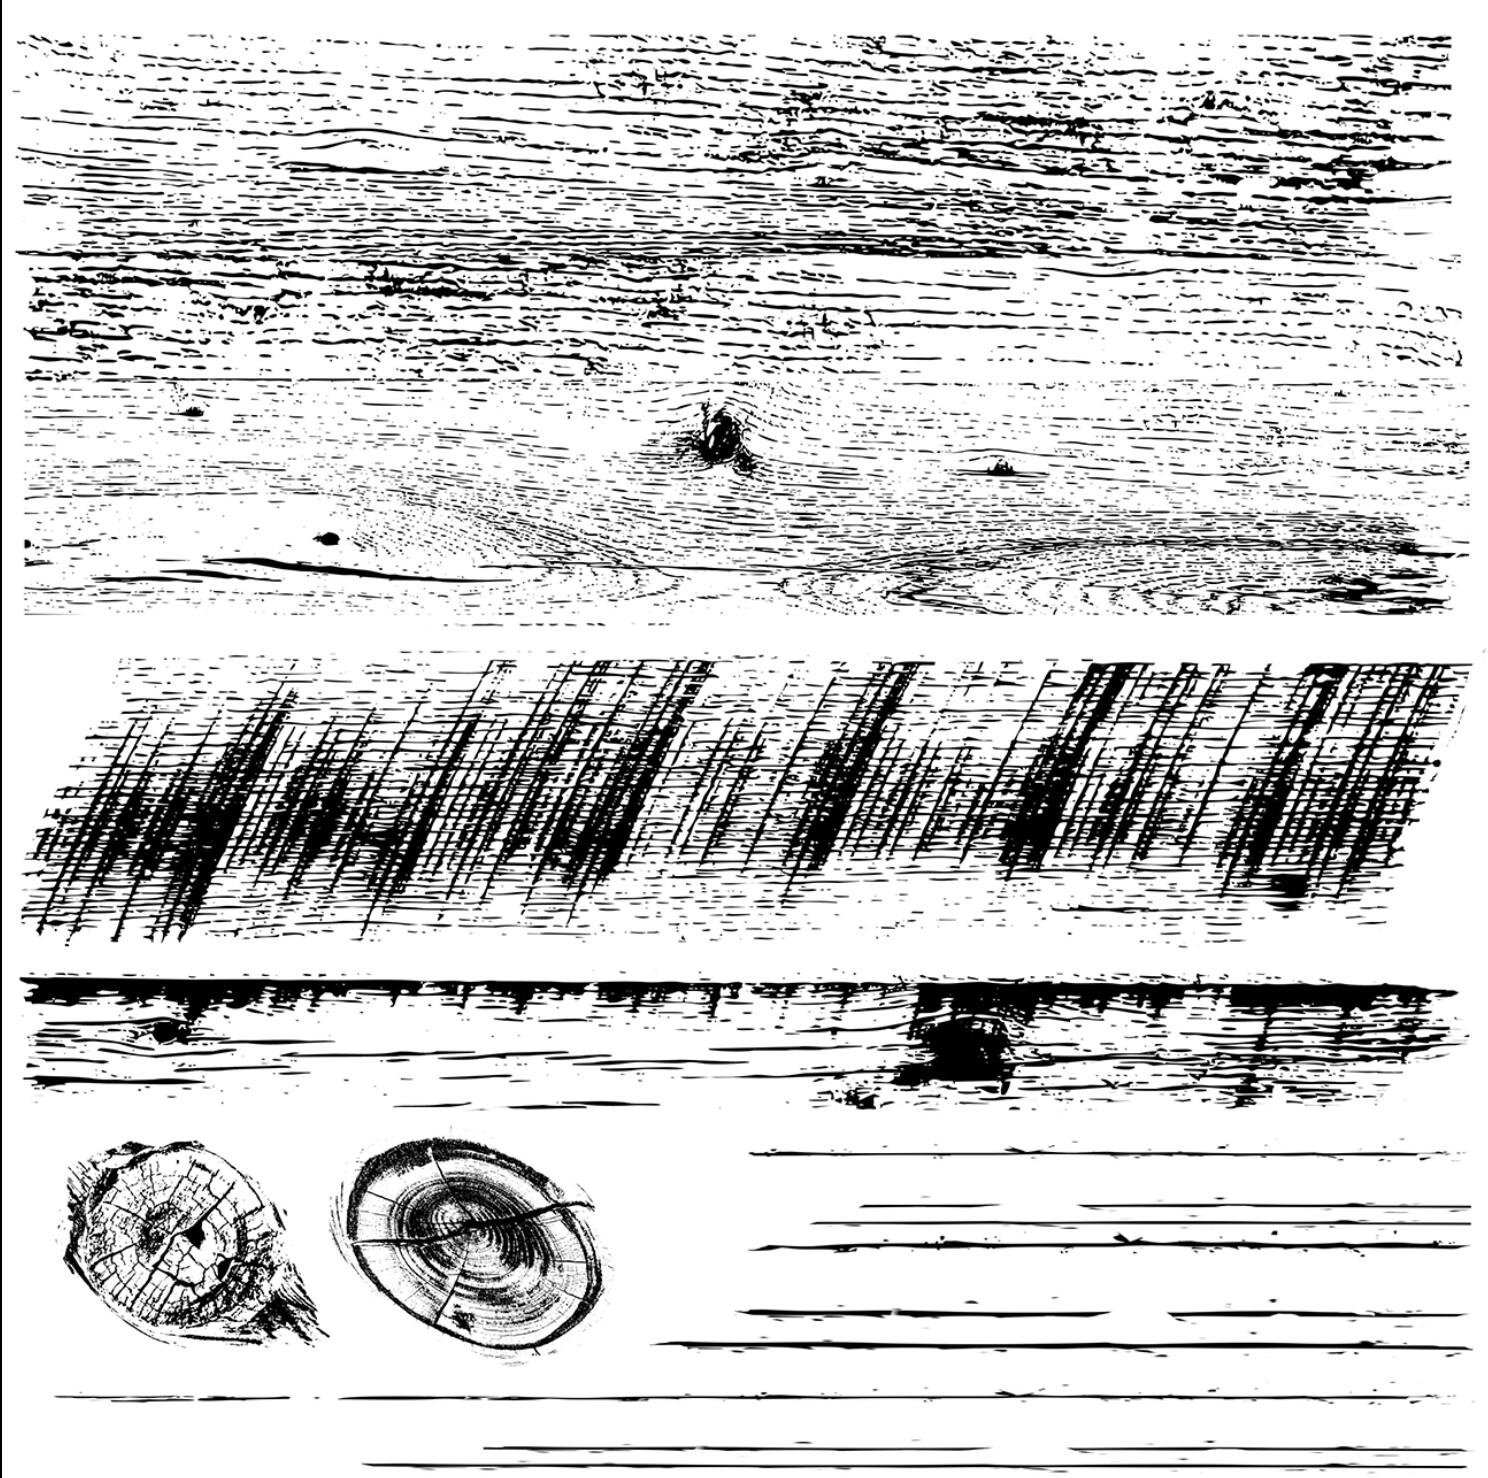 IOD BARNWOOD PLANKS  12×12 2 Sheets DECOR STAMP